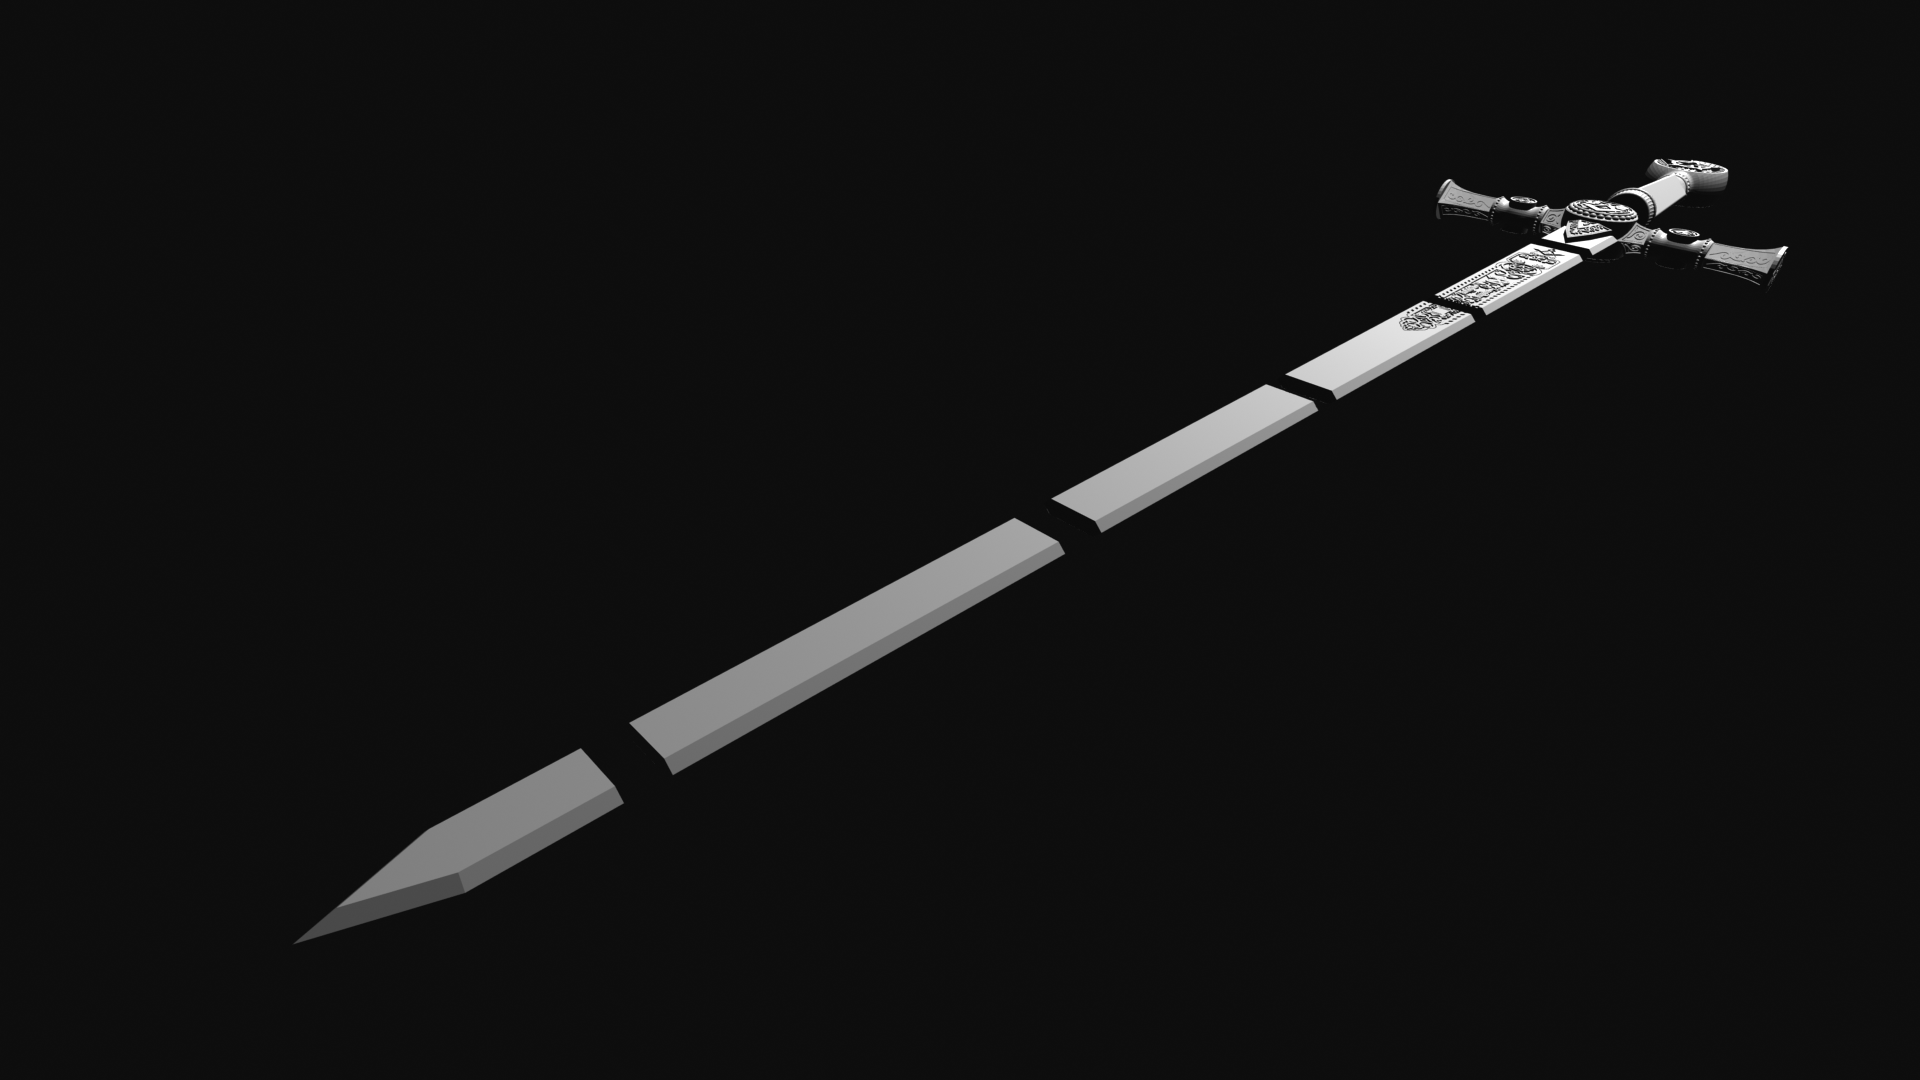 masonic2.png Download STL file Masonic Ceremony Sword-Ready 3D Print • 3D printable template, GokBoru